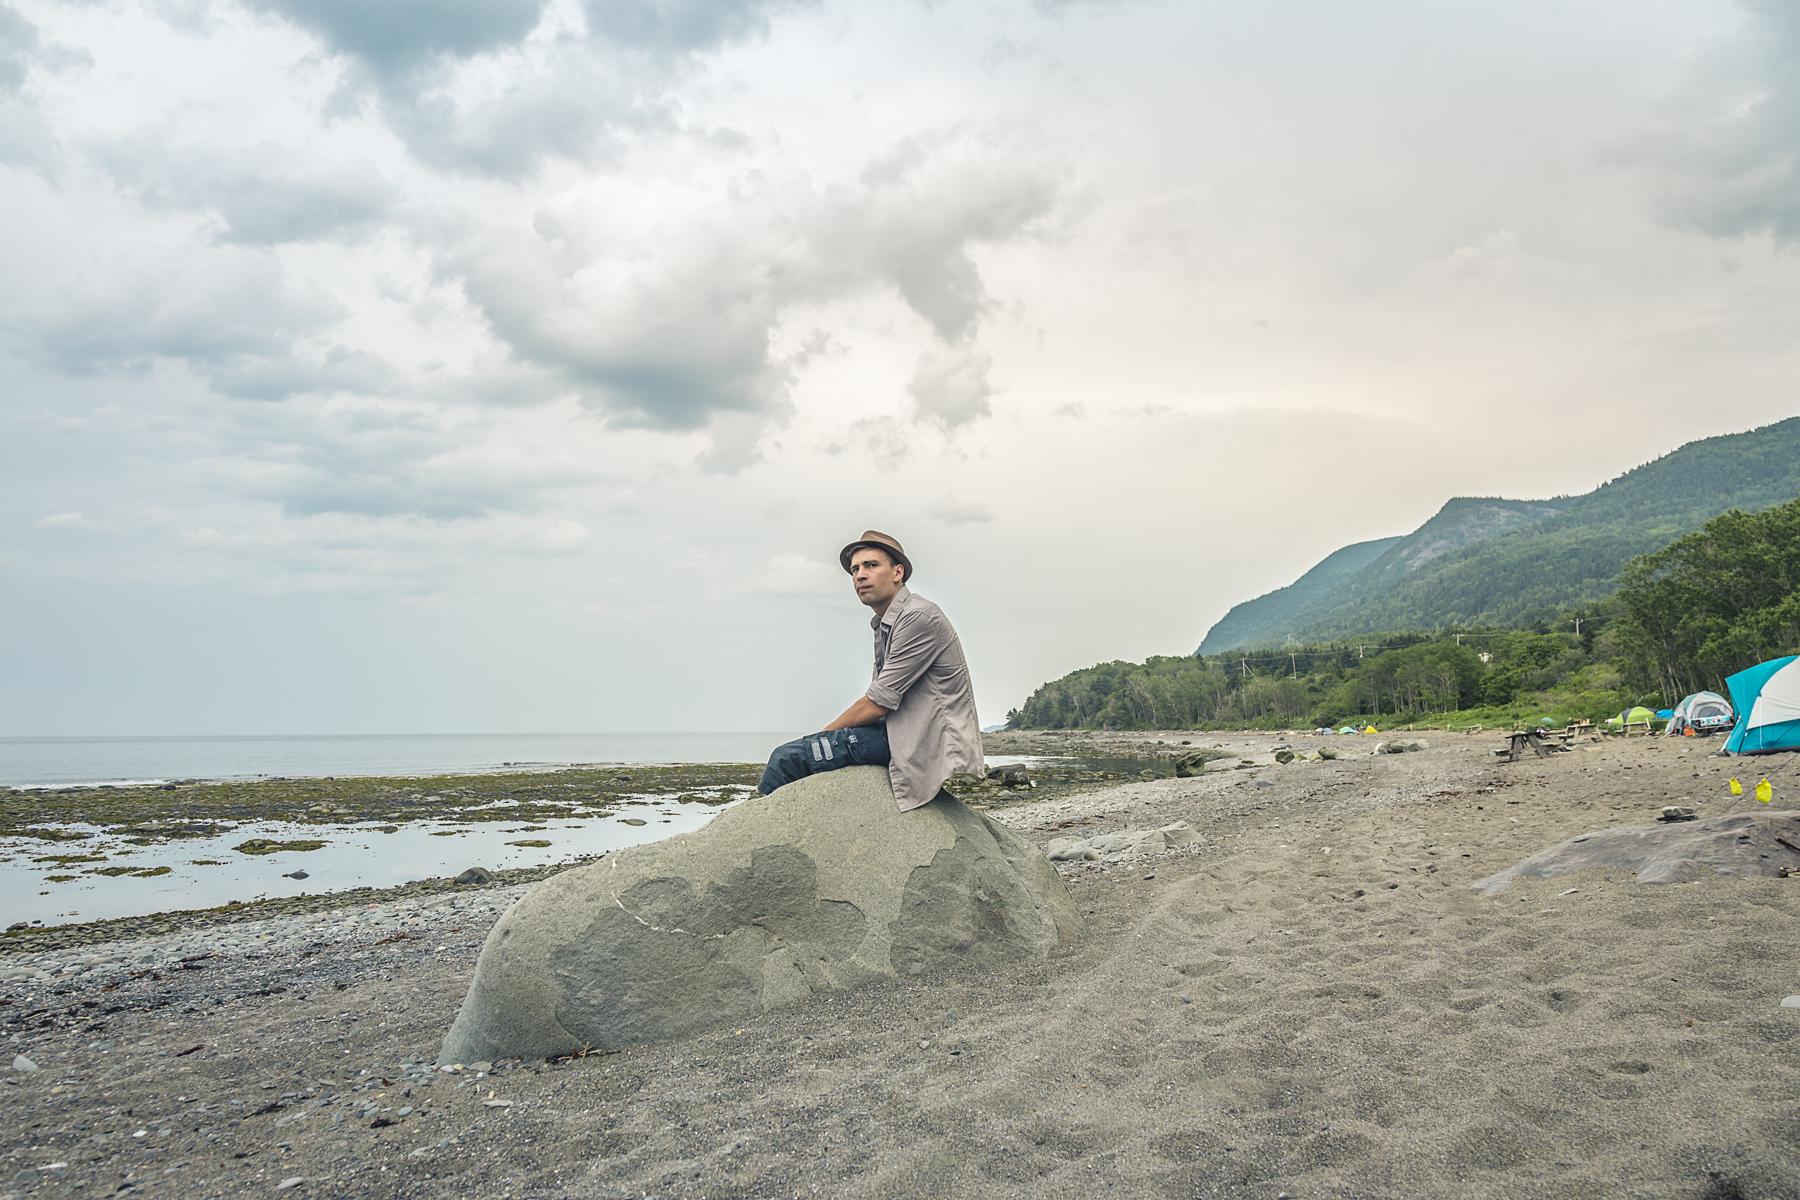 Auberge Festive Sea Shack - Gaspesie - Quebec - Canada - Tora Photography